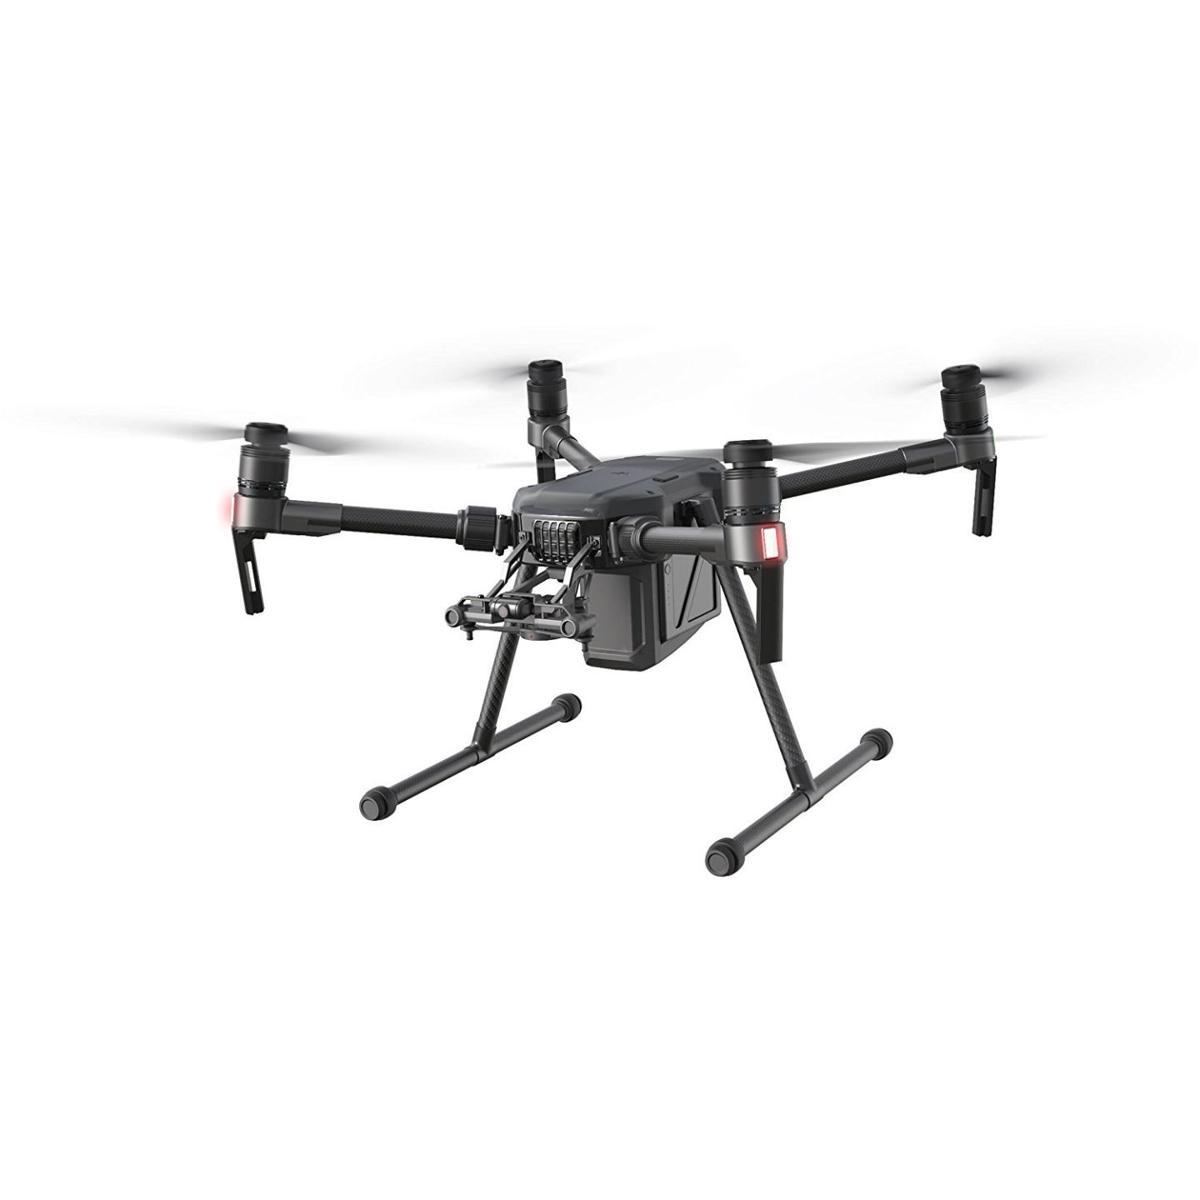 Matrice drone